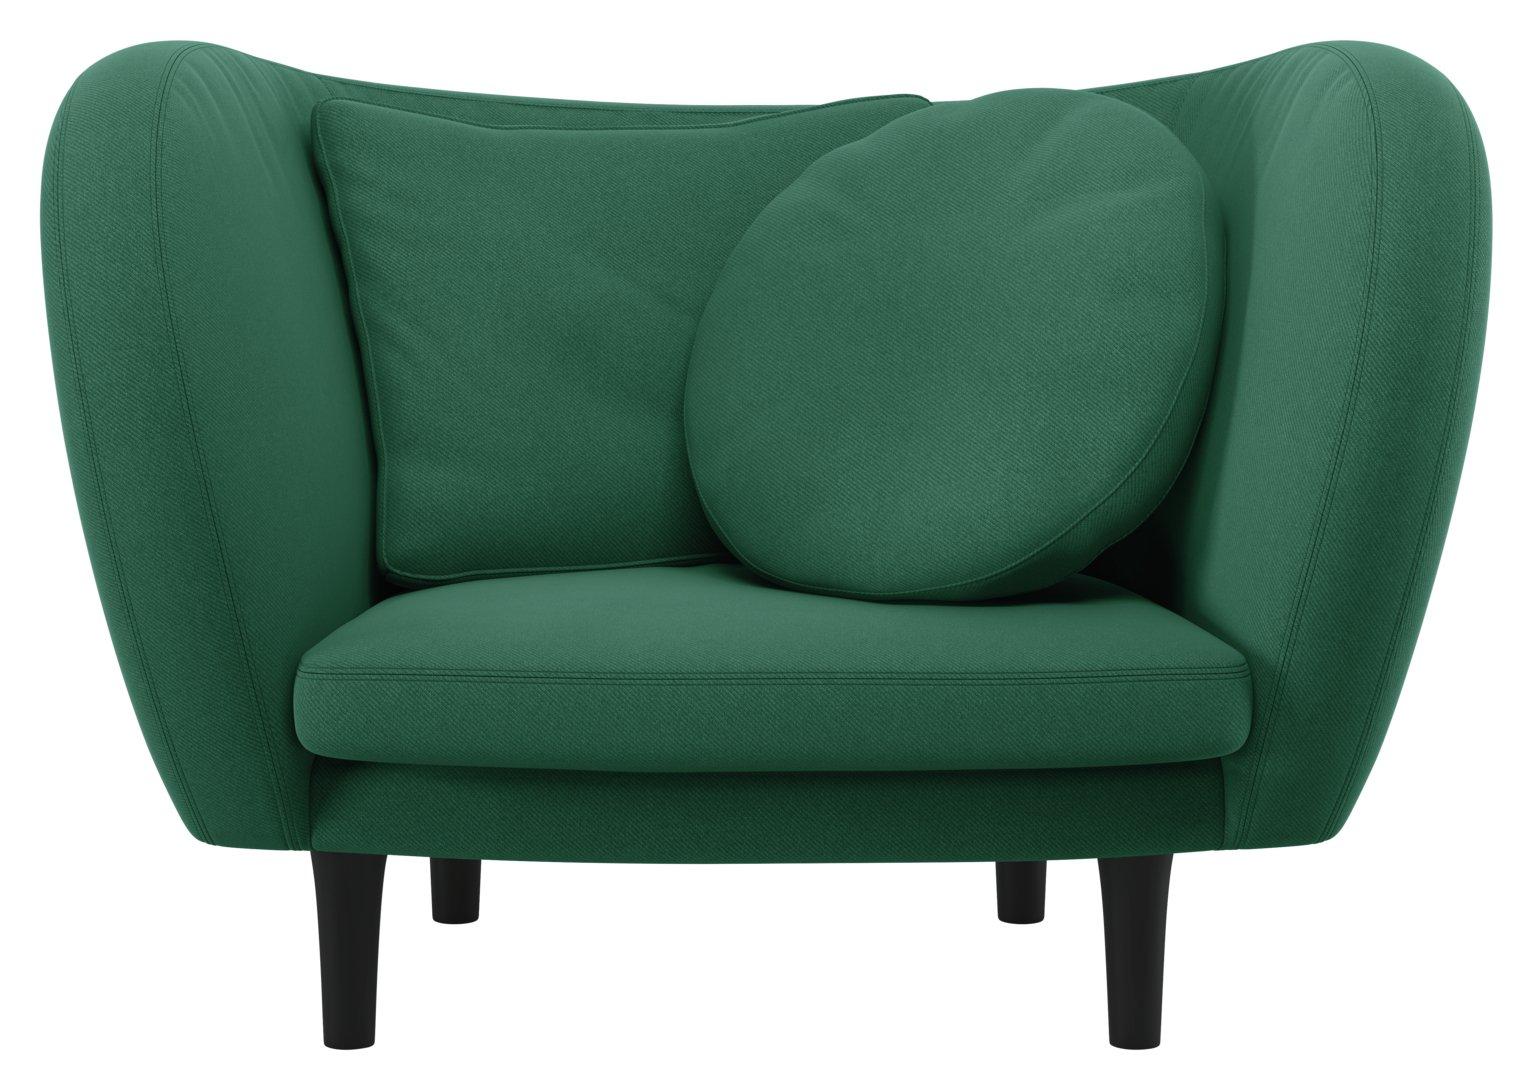 Habitat Arya Green Fabric Armchair